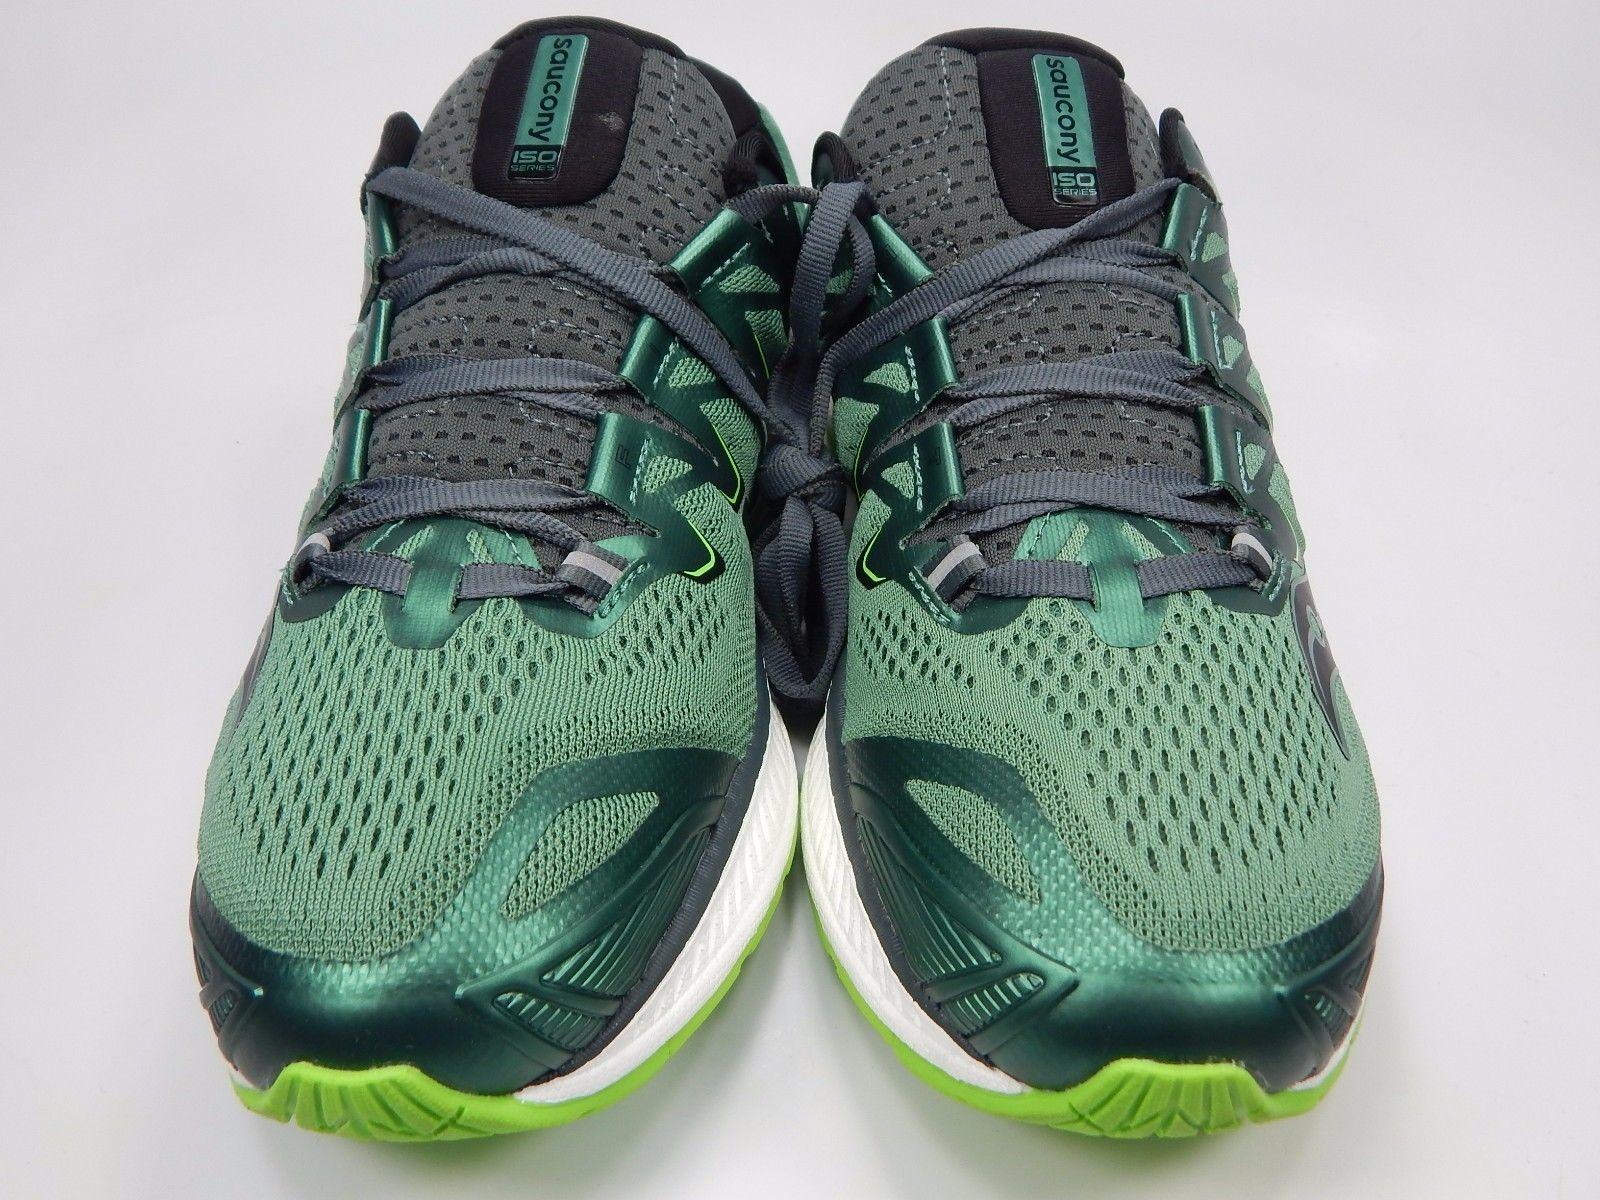 Saucony Triumph ISO 4 Men's Running Shoes Size US 9 M (D) EU 42.5 Green S20413-3